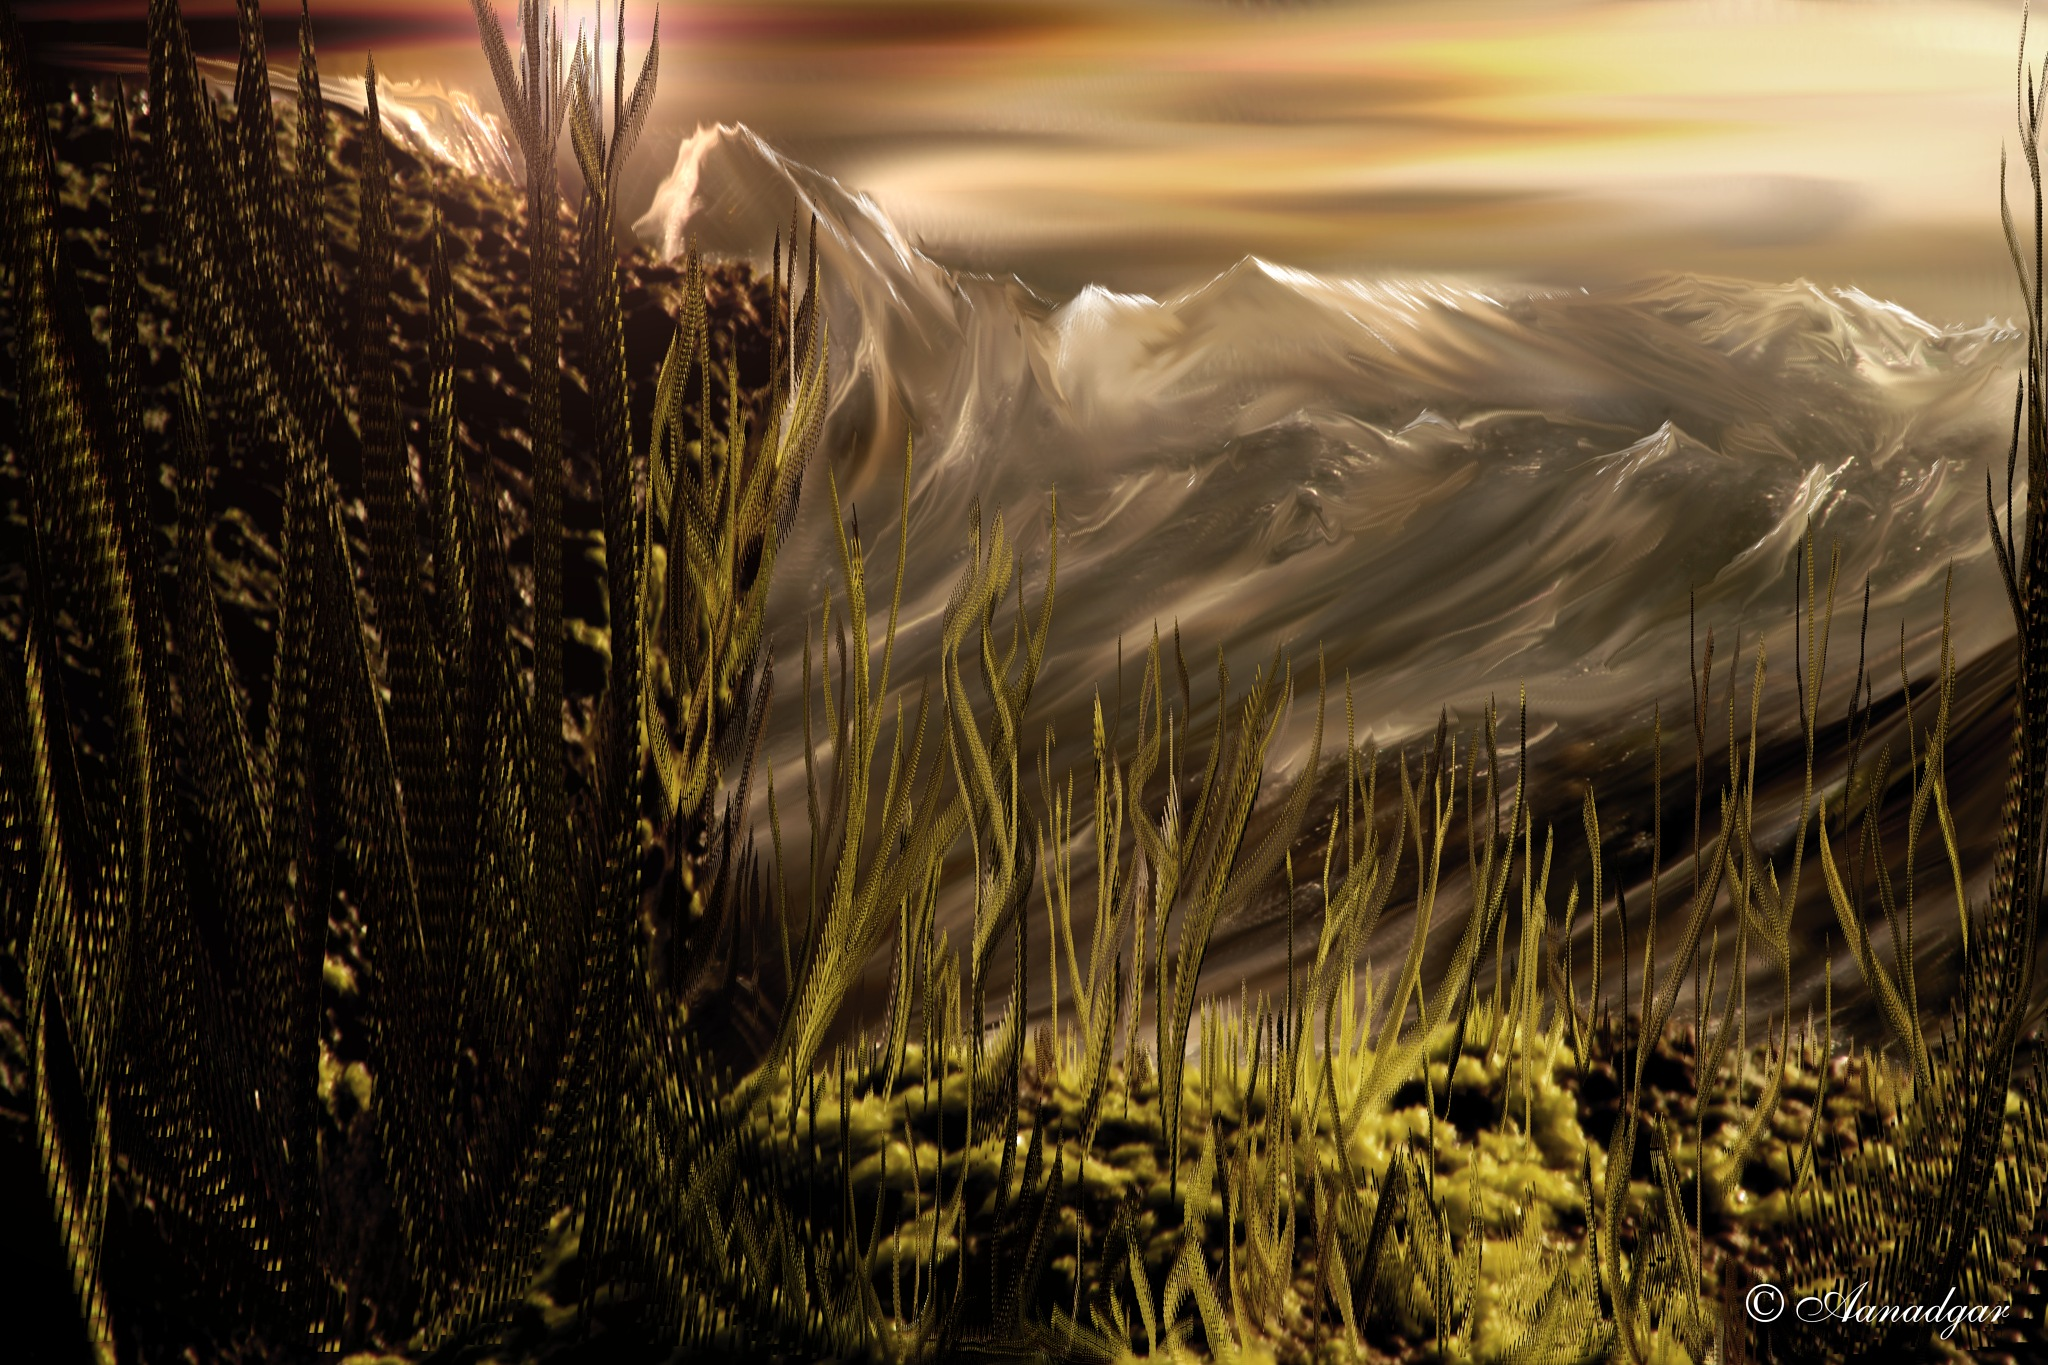 Vieja montaña by Anadgar03